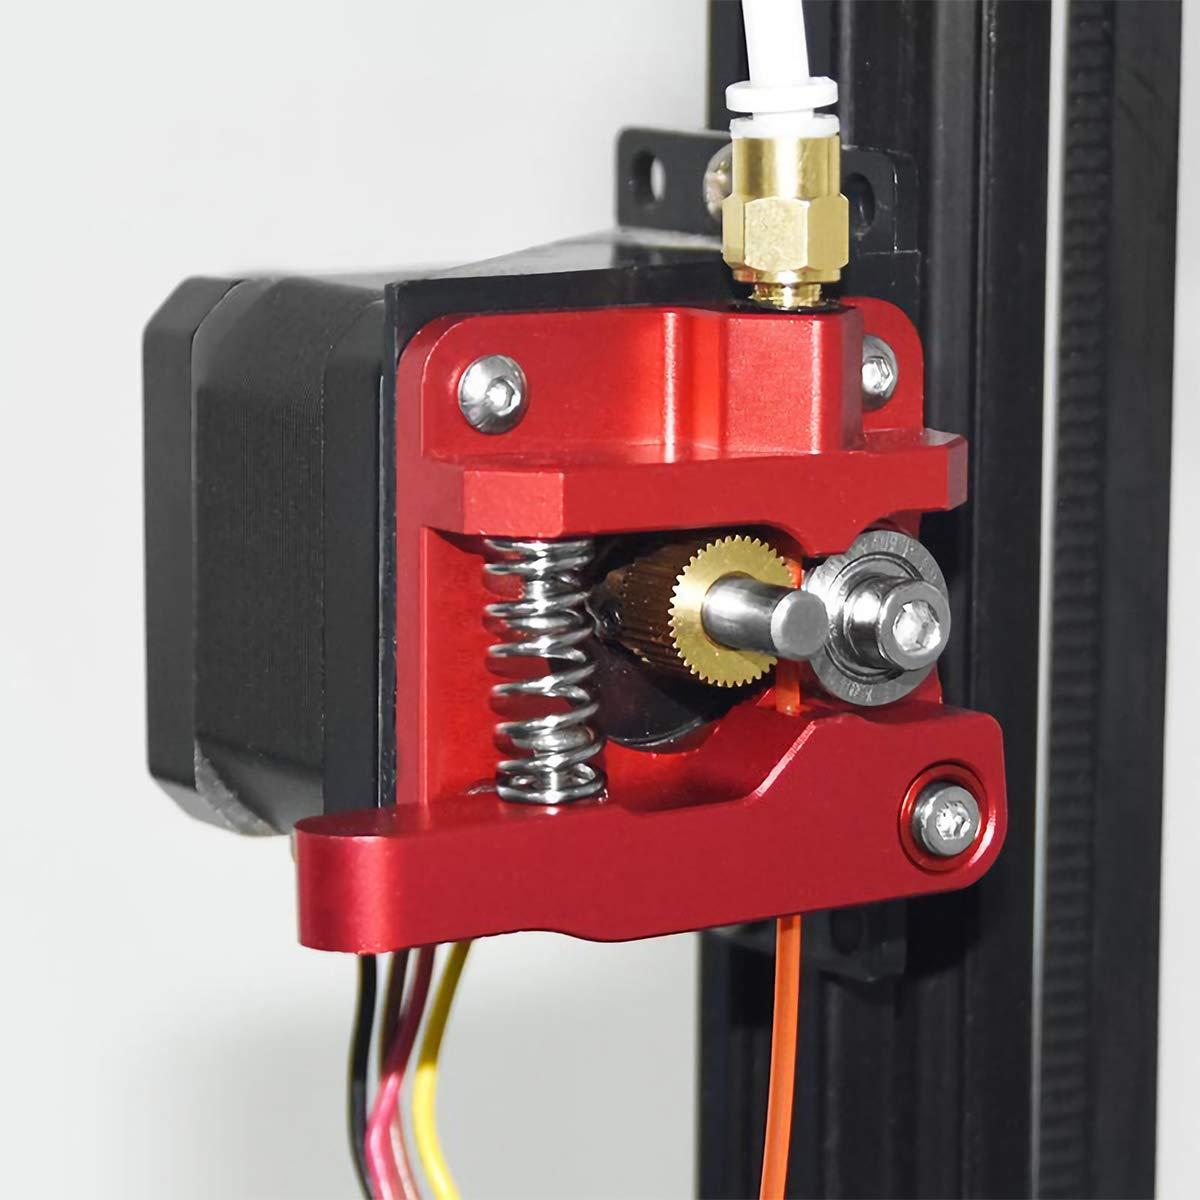 CR-10 S4 CR-10 S5 3D Drucker TL-Smoother Ender 3 Extruder Kit Upgrade Ersatz Aluminium MK8 Drive Feed Sock Tube Stepper Motor Vibration D/ämpfer Feder f/ür Creality Ender 3 CR-10 CR-10S